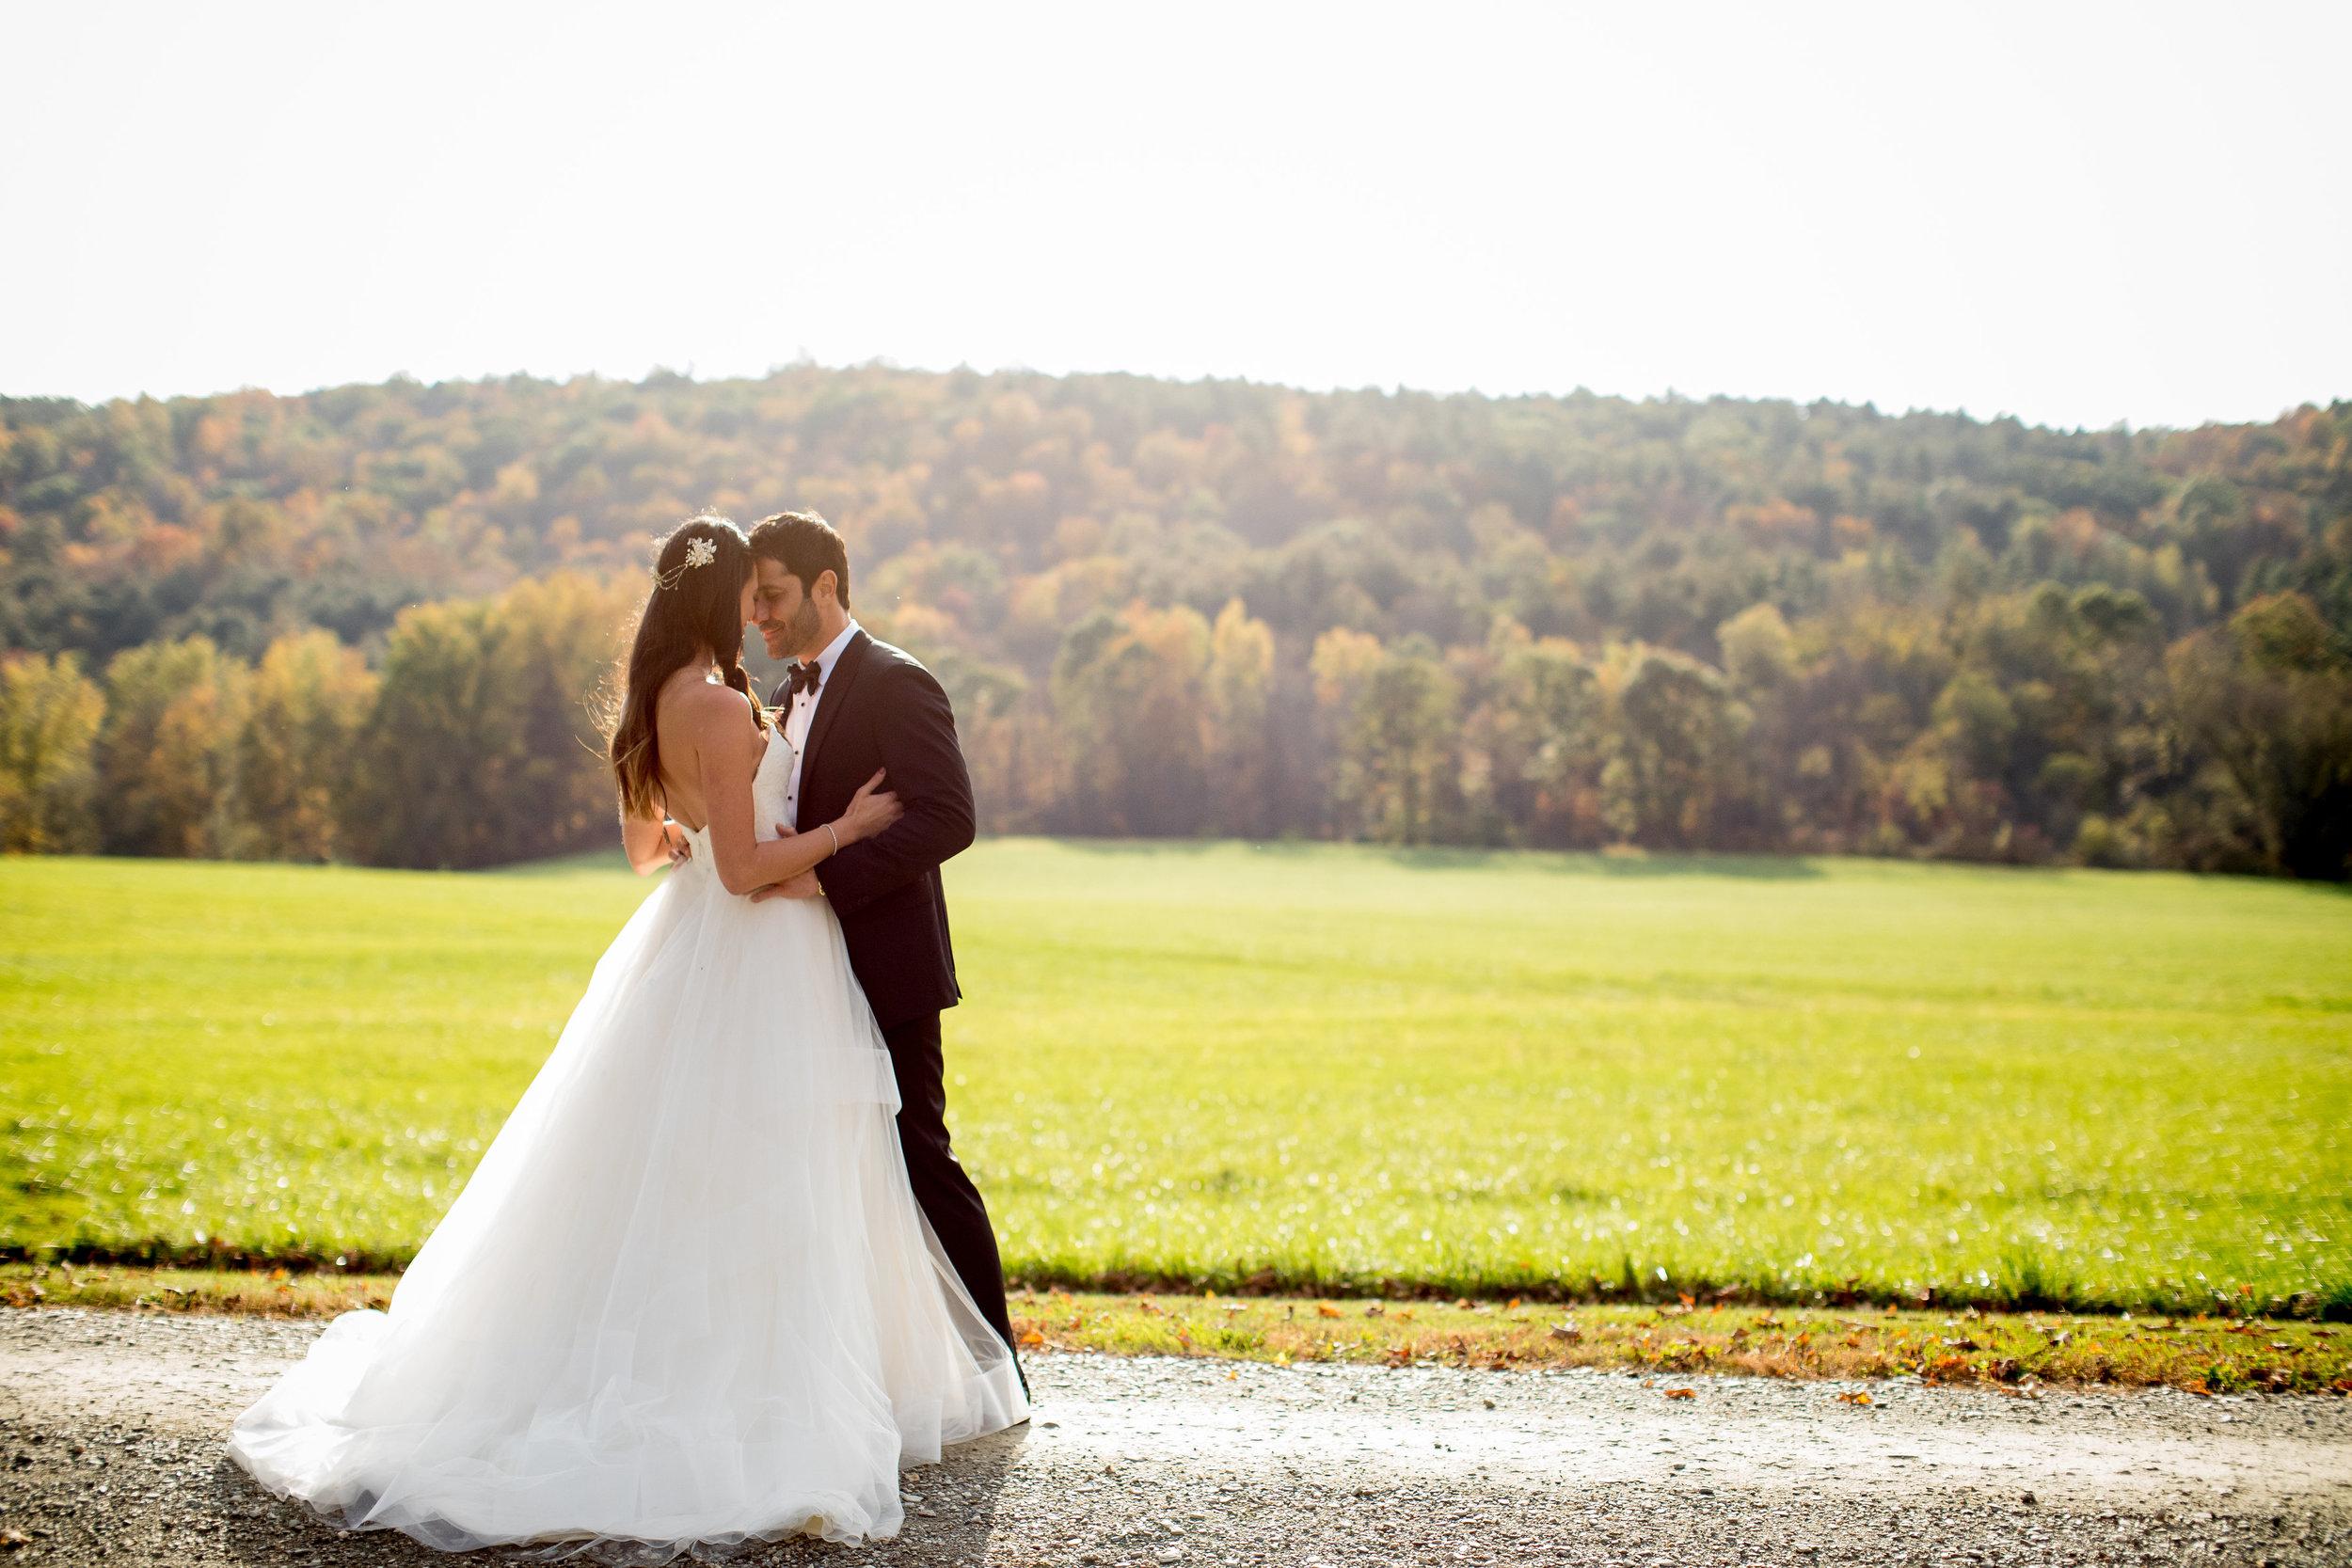 Nipmoose Barns                                                        Rustic/Chic Fall Wedding